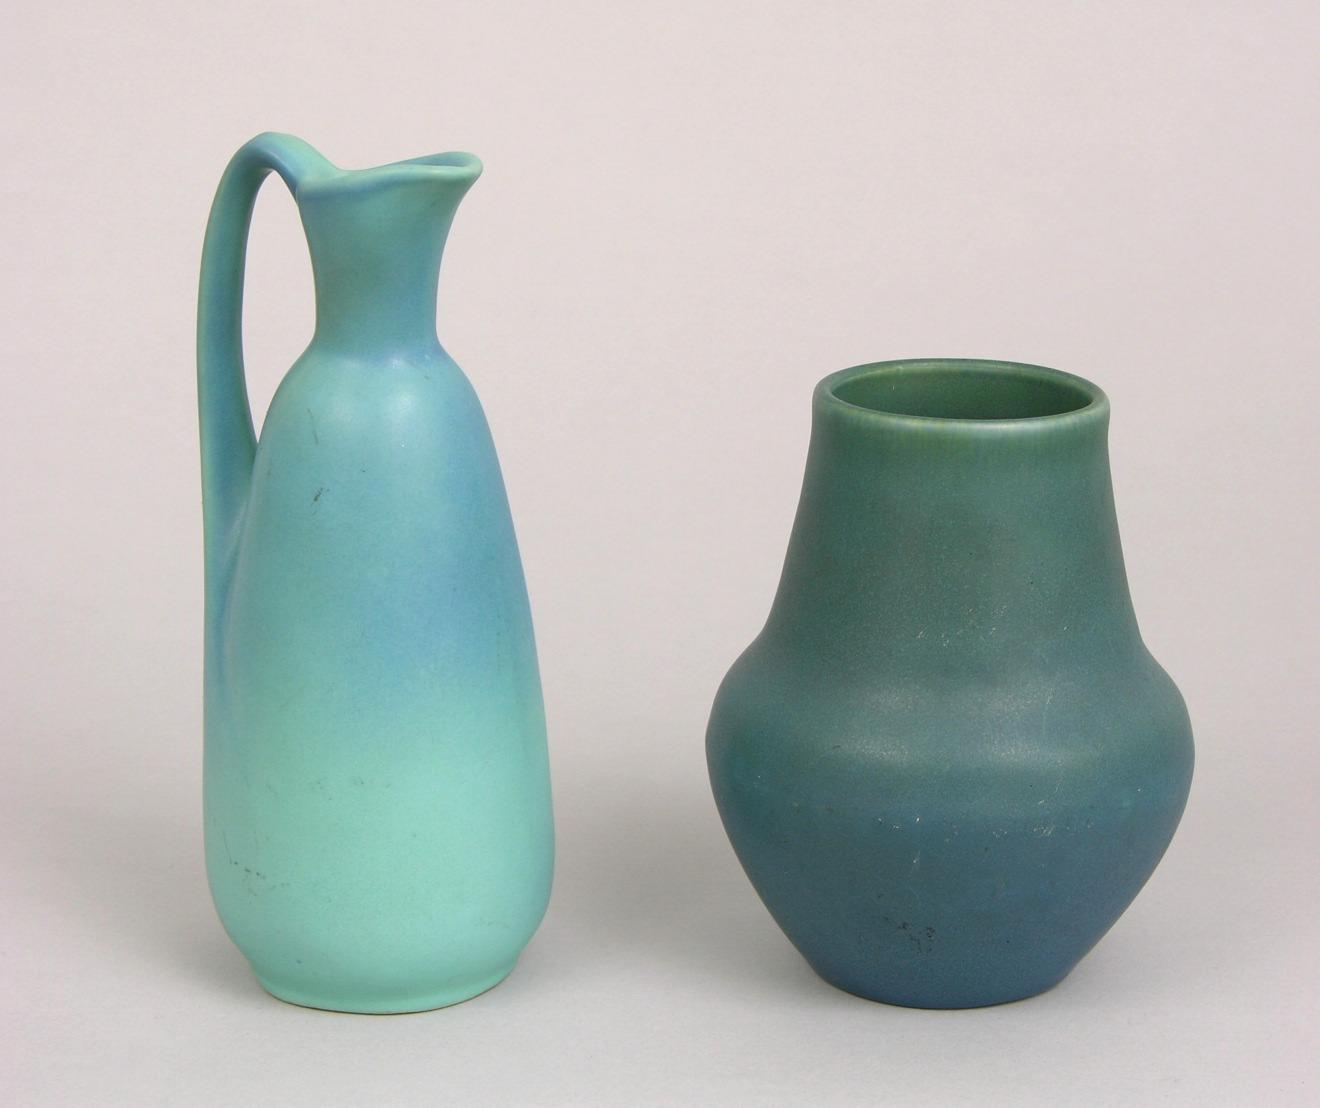 A rookwood vase and a van briggle ewer 030709 sold 1955 a rookwood vase and a van briggle ewer reviewsmspy